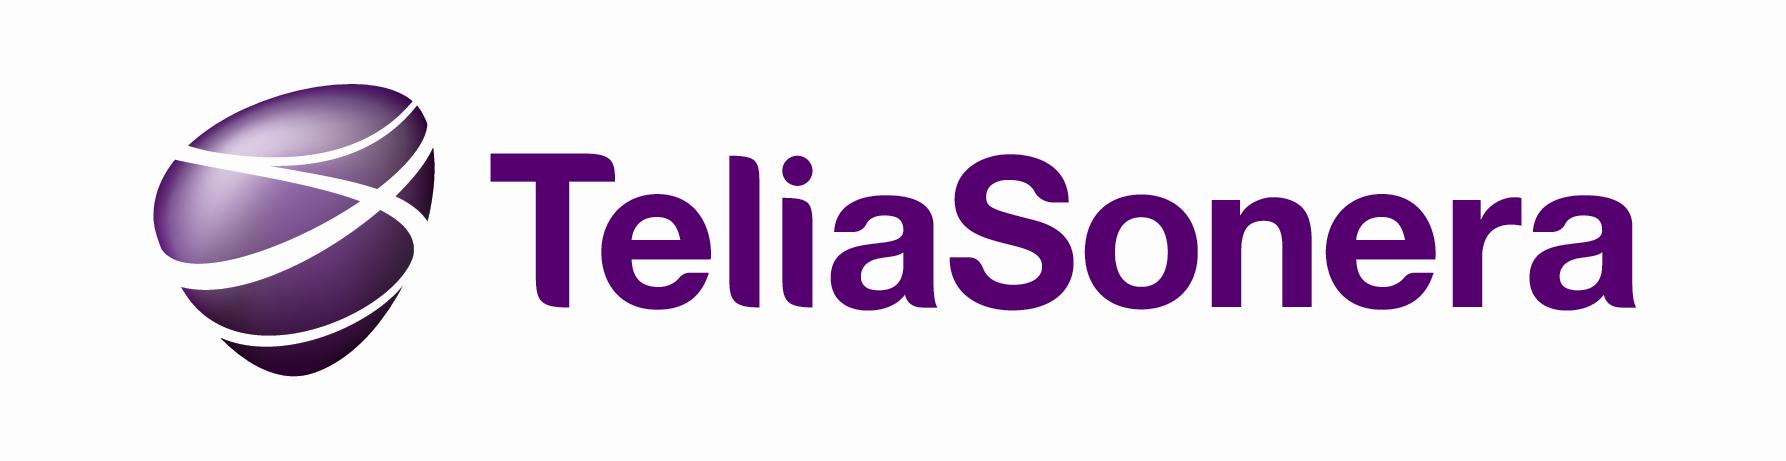 telia_sonera_logo